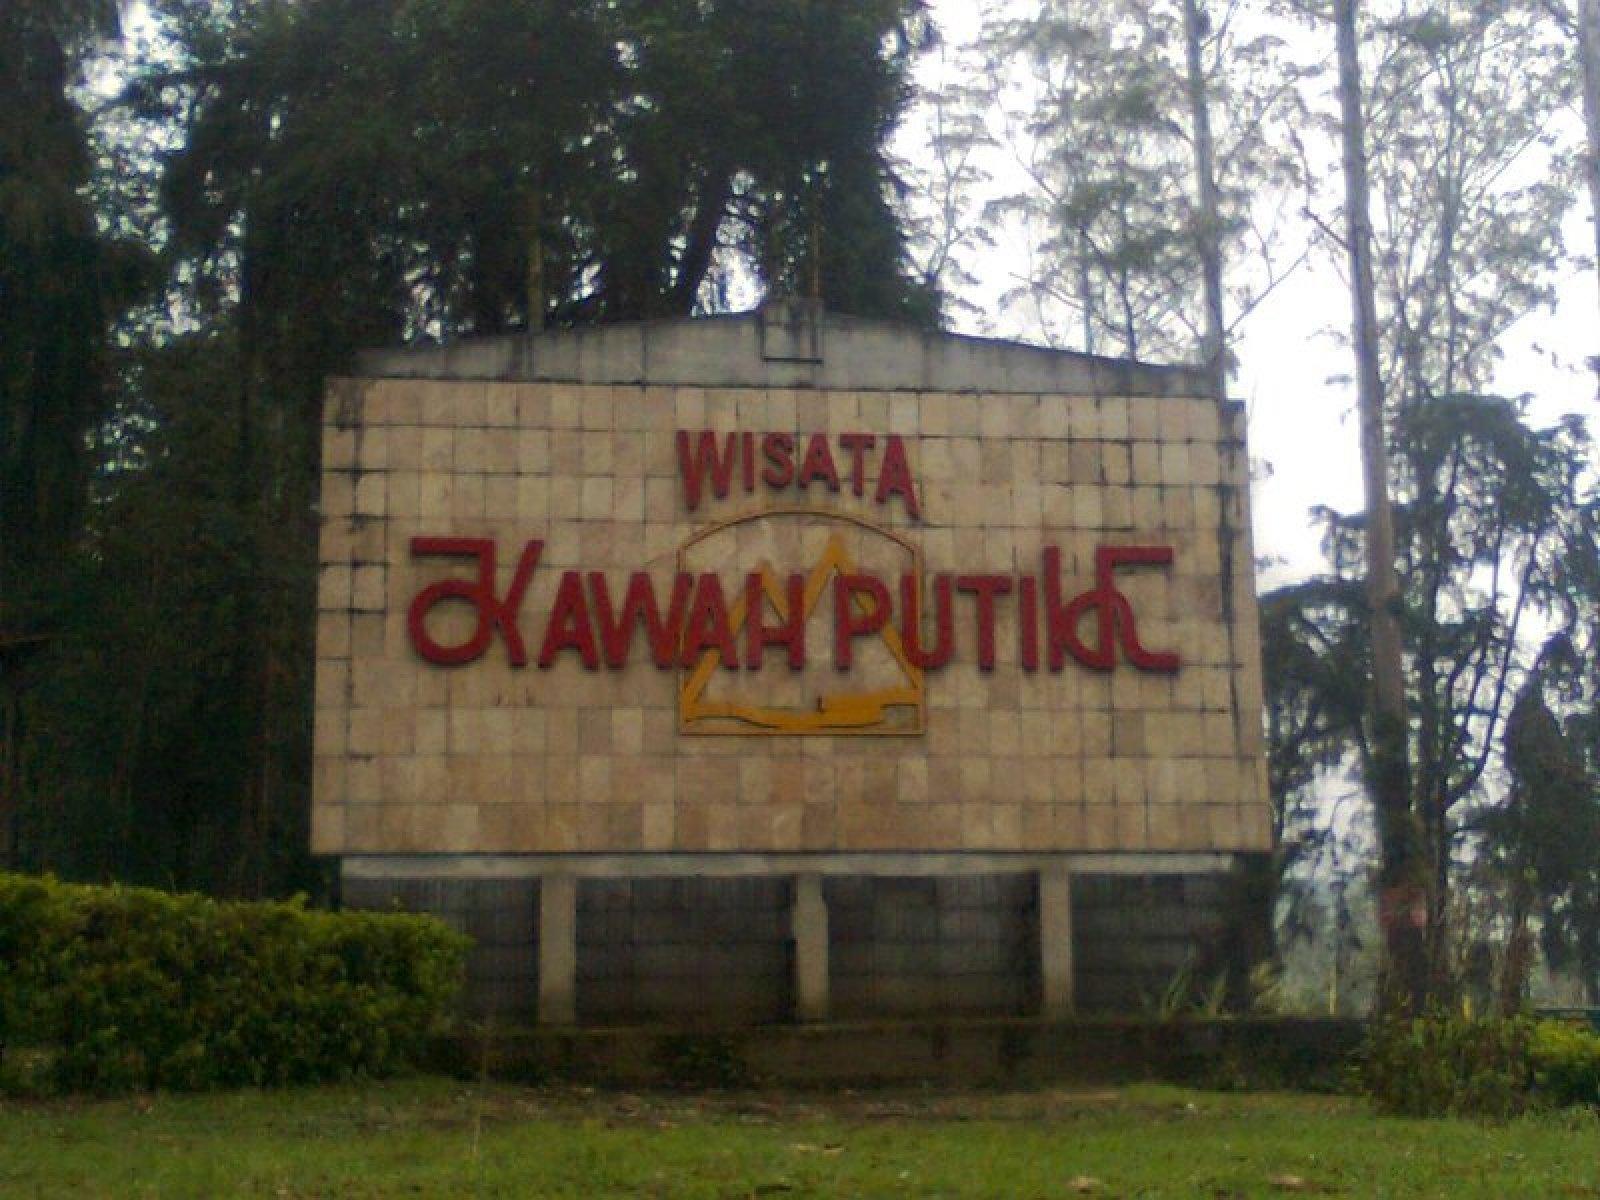 Wisata Kawah Putih Bandung